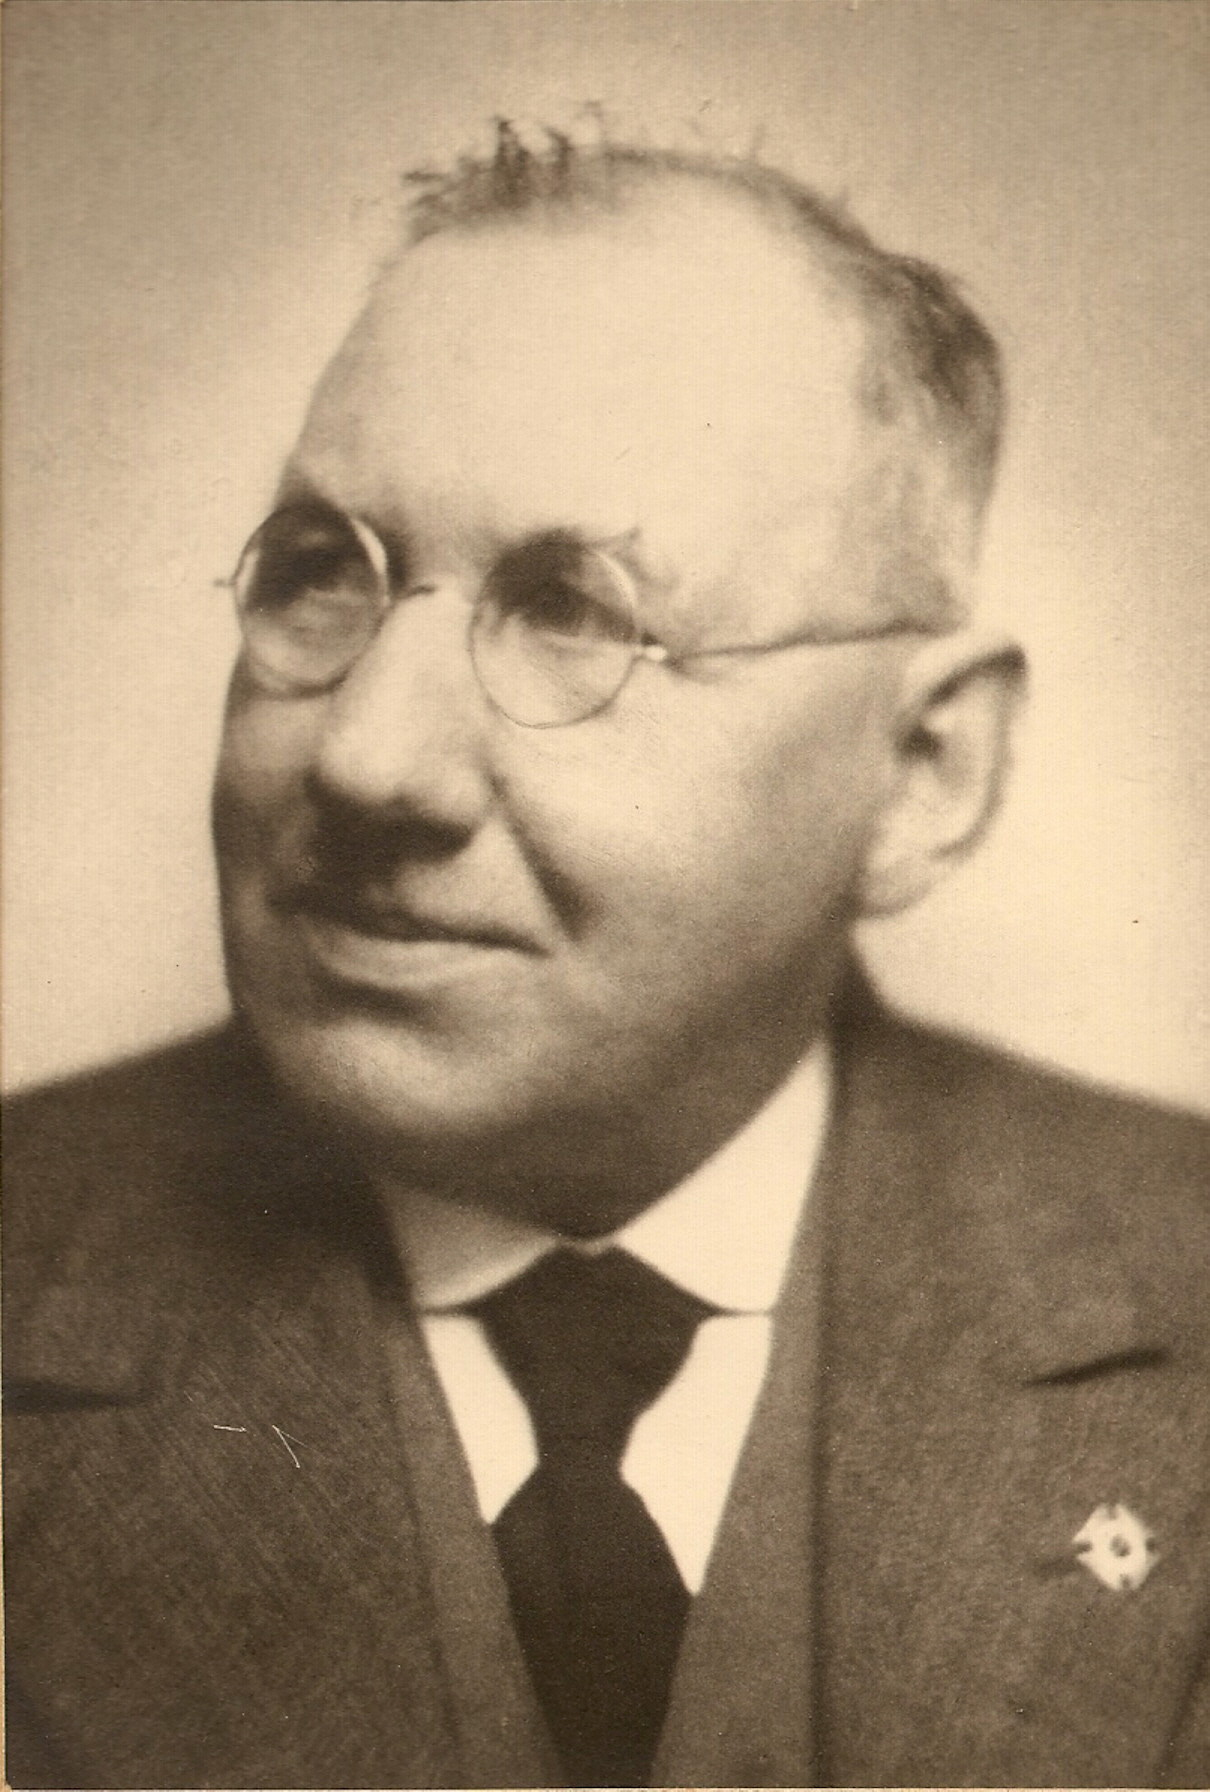 Svend Christian Svendsen